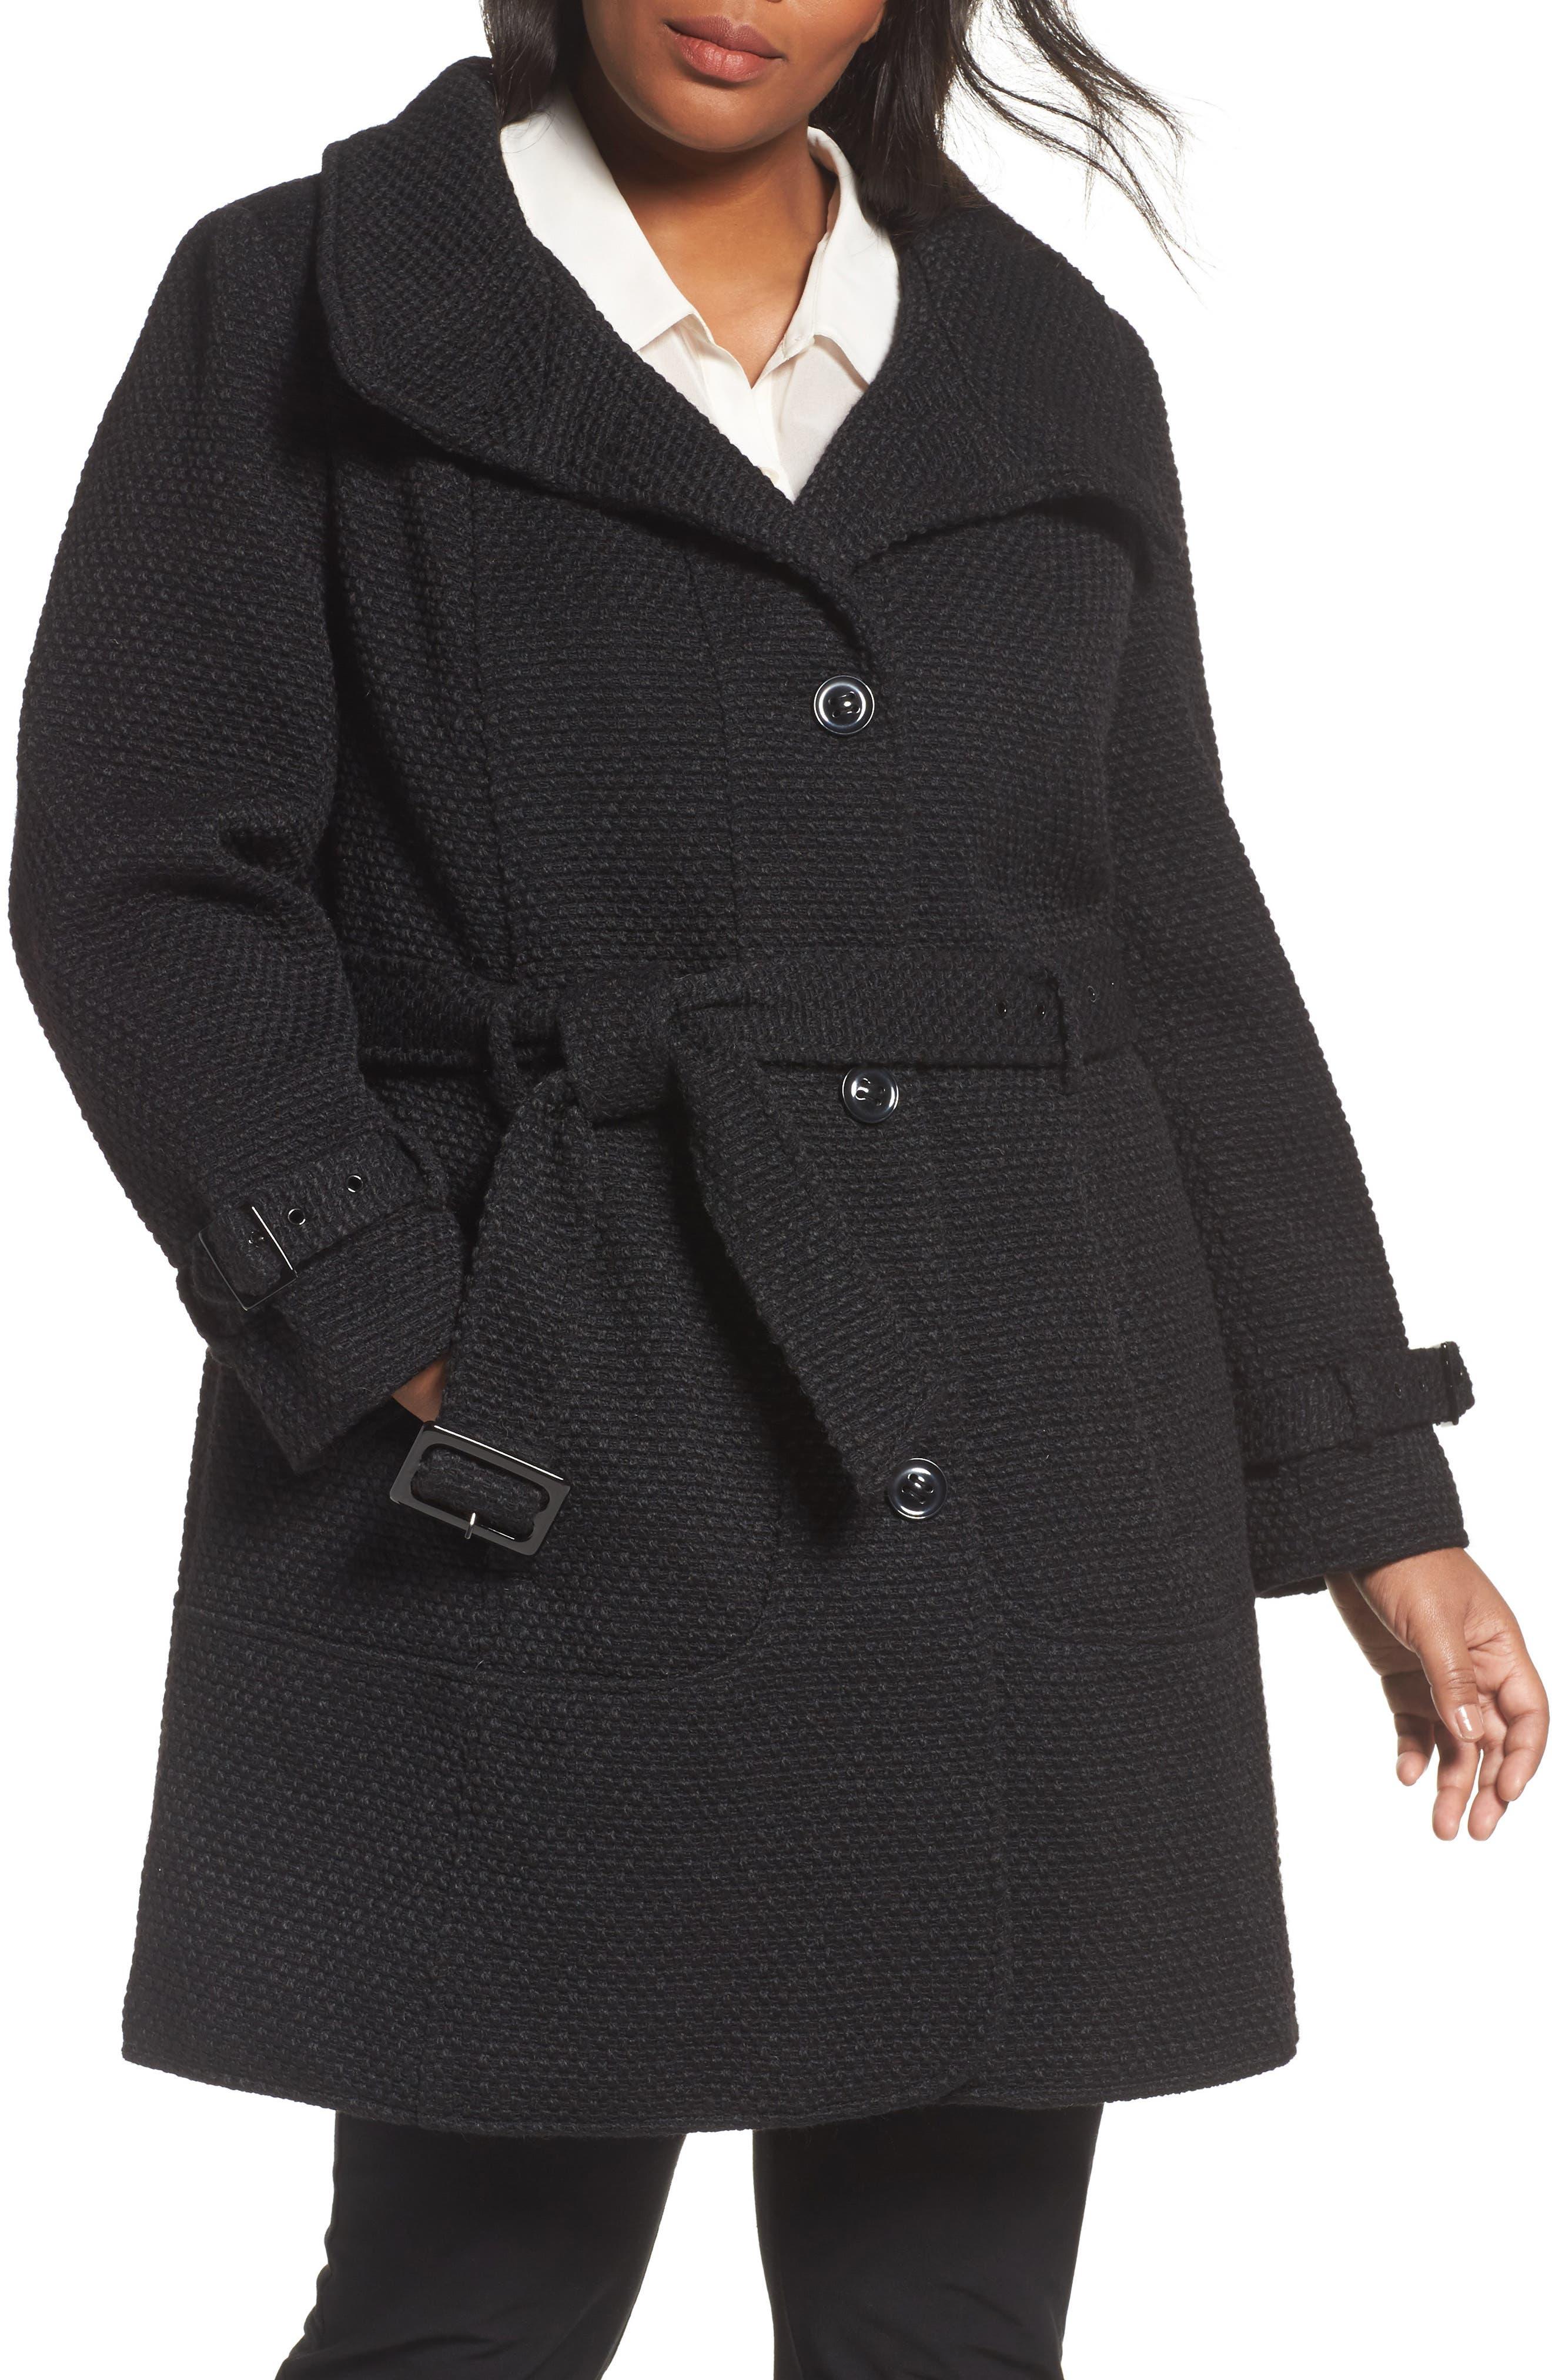 Waffle Woven Coat,                         Main,                         color, Black